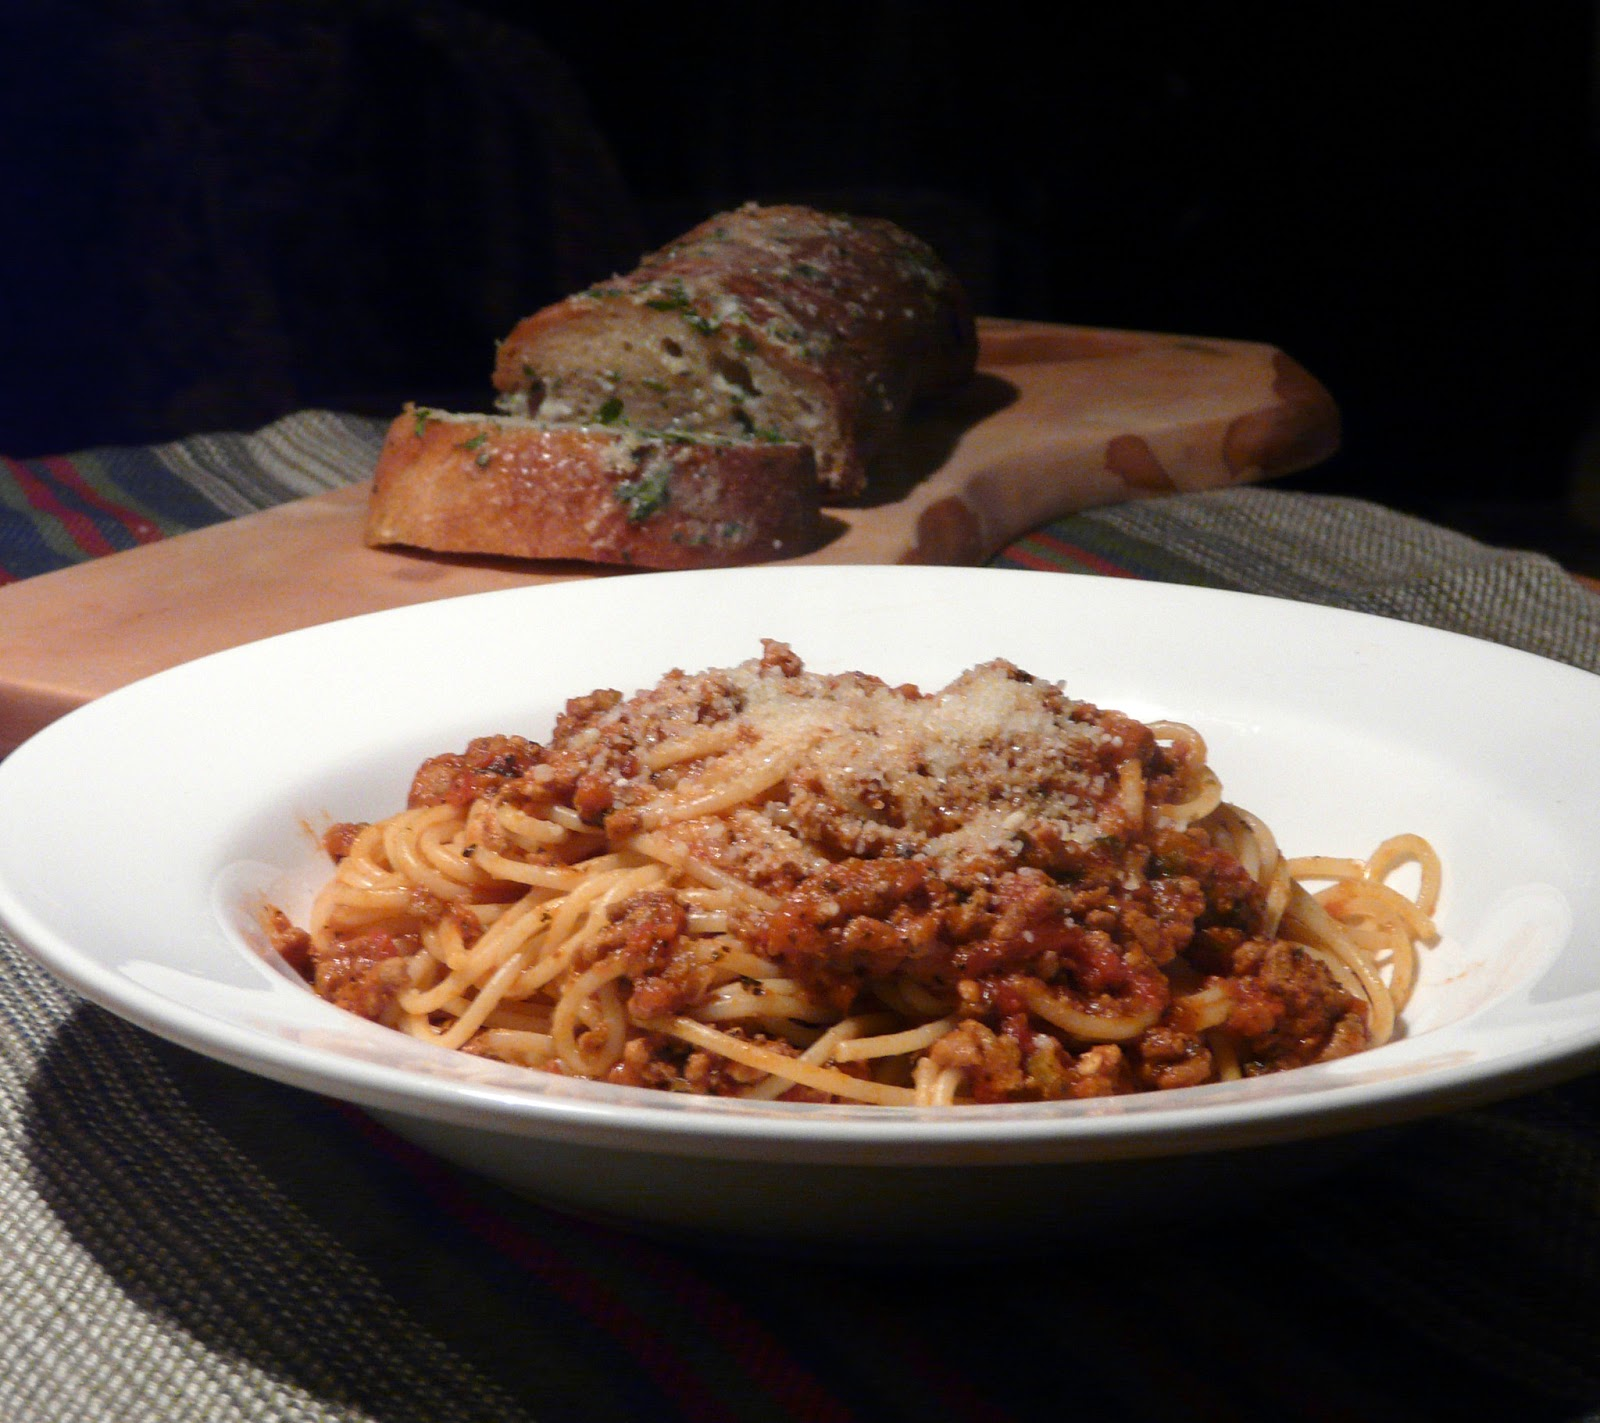 Thibeault's Table: Spaghetti Bolognese with Gorgonzola Garlic Bread